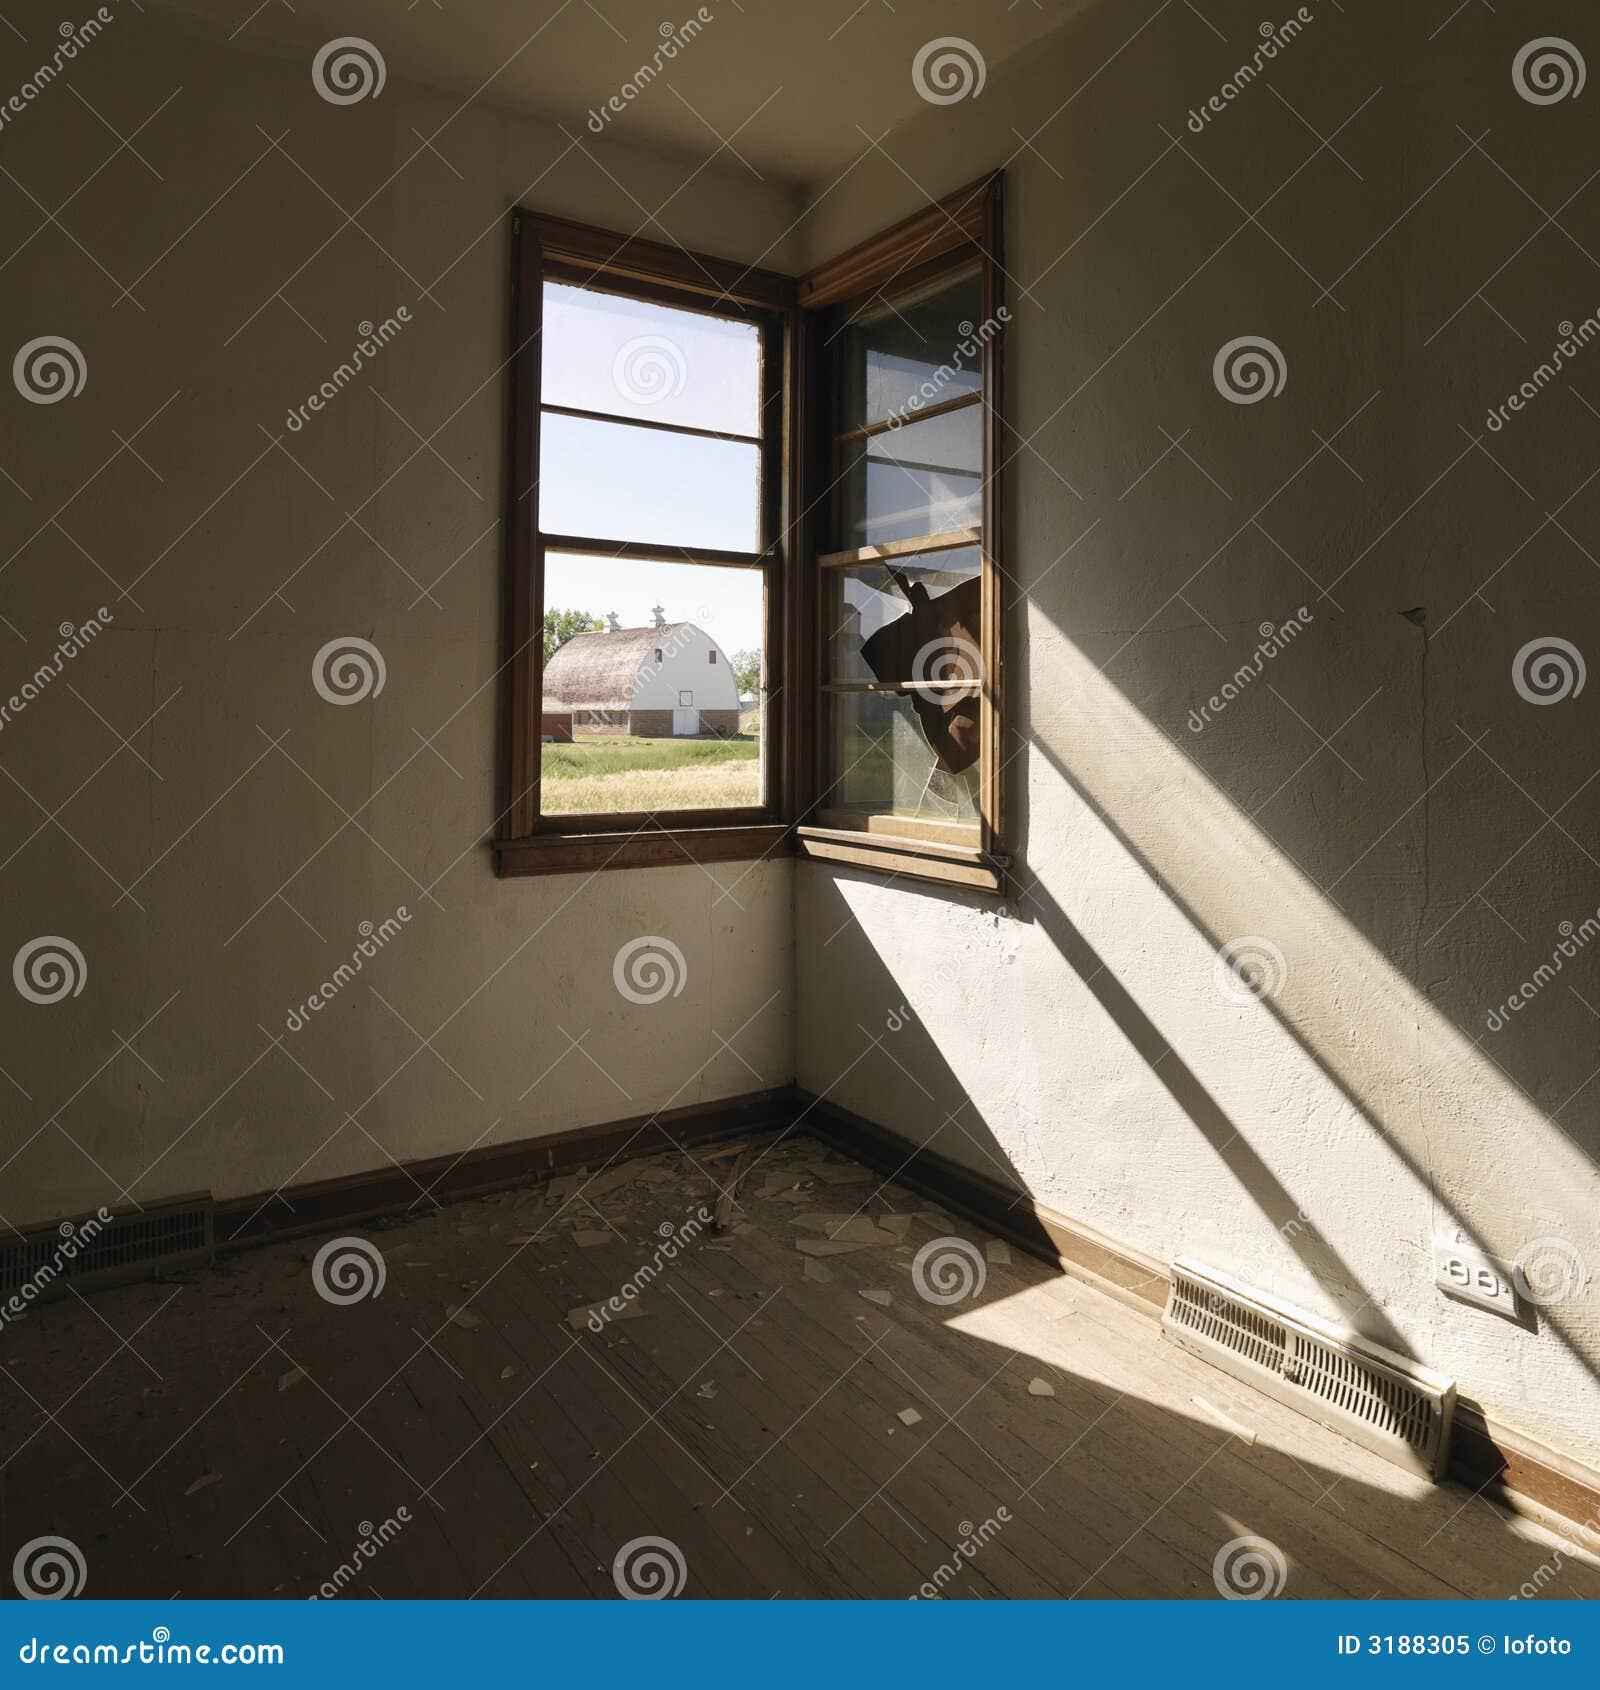 Dark empty room with window - Empty Room With Window Dark Empty Room With Window